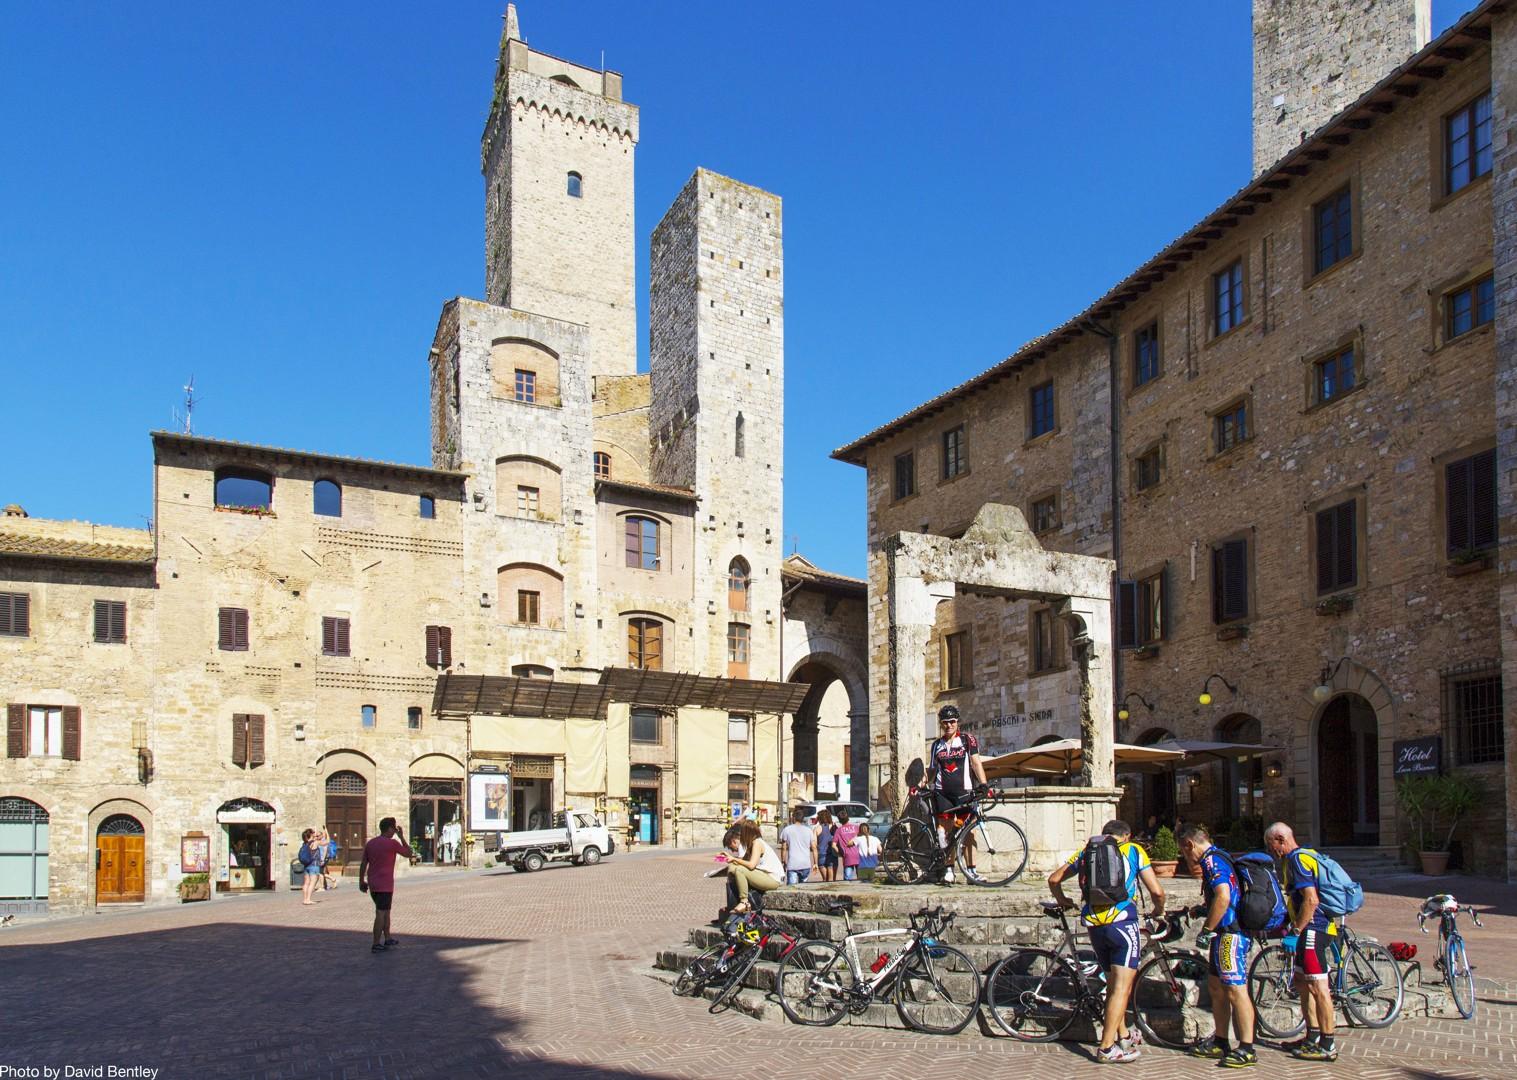 tuscany-self-guided-road-cycling.jpg - Italy - Tuscany Tourer - Self Guided Road Cycling Holiday - Italia Road Cycling